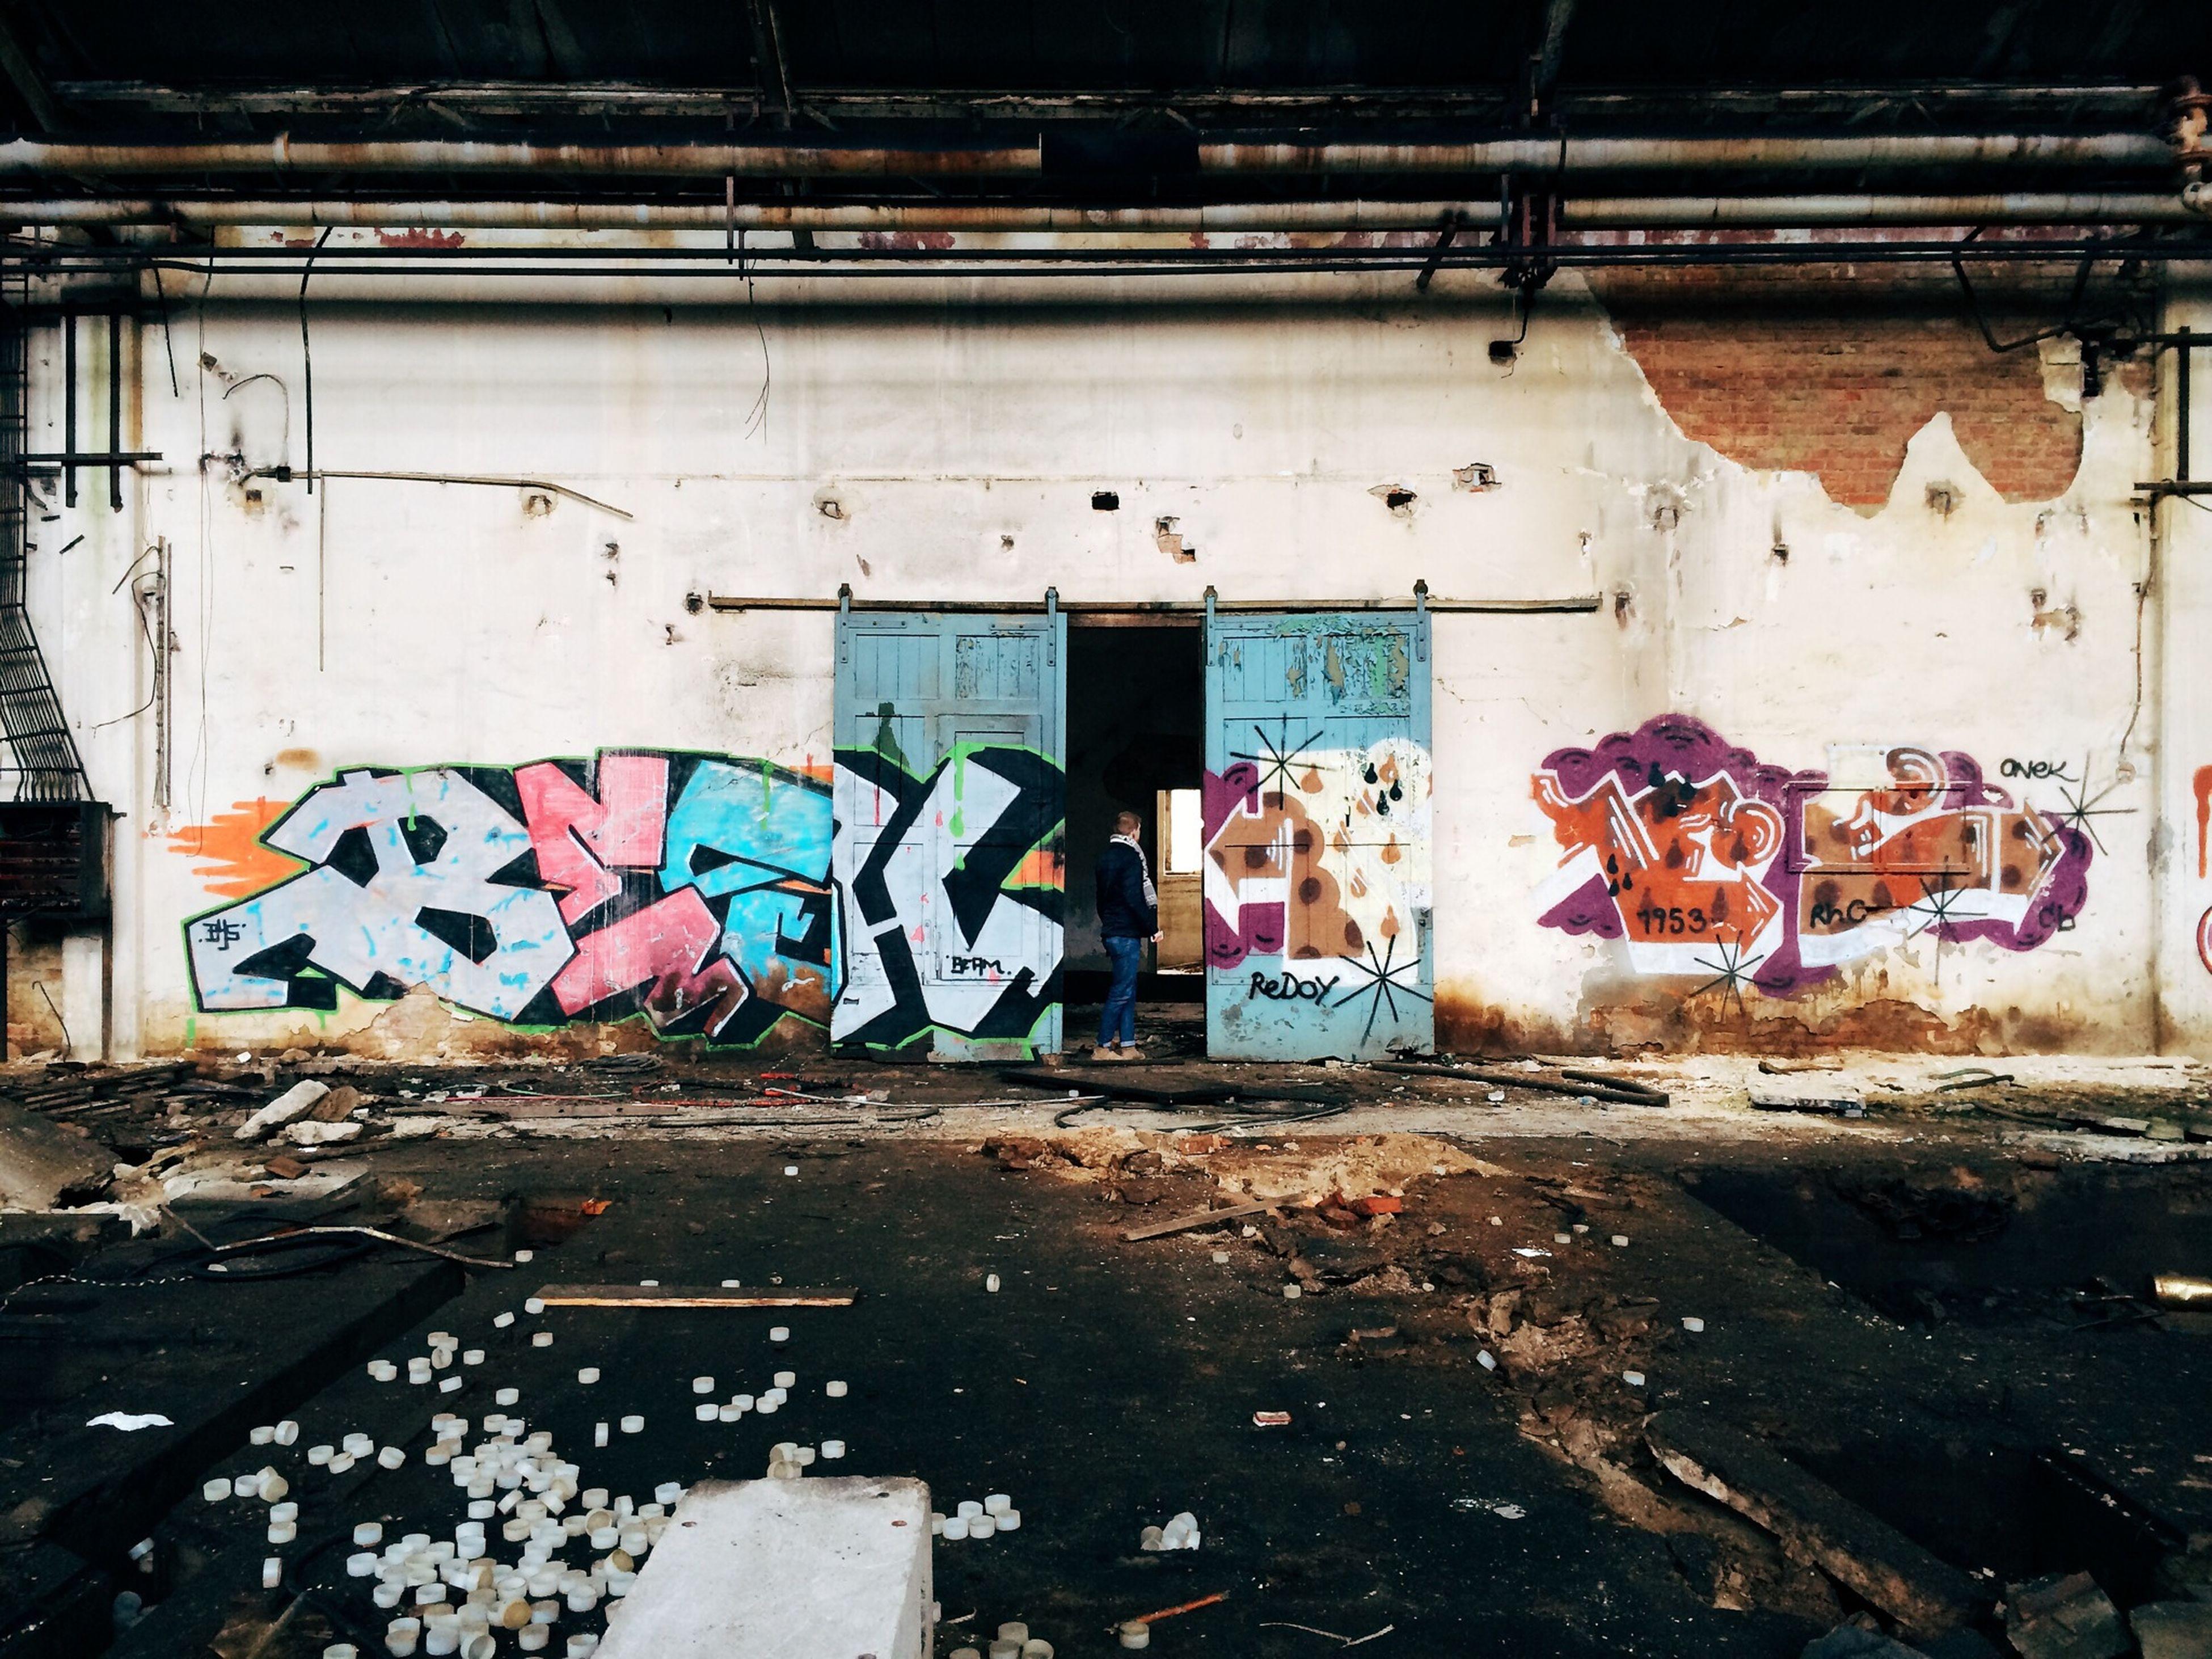 Vscocam Abandoned Fltrlive Graffiti My Best Photo 2014